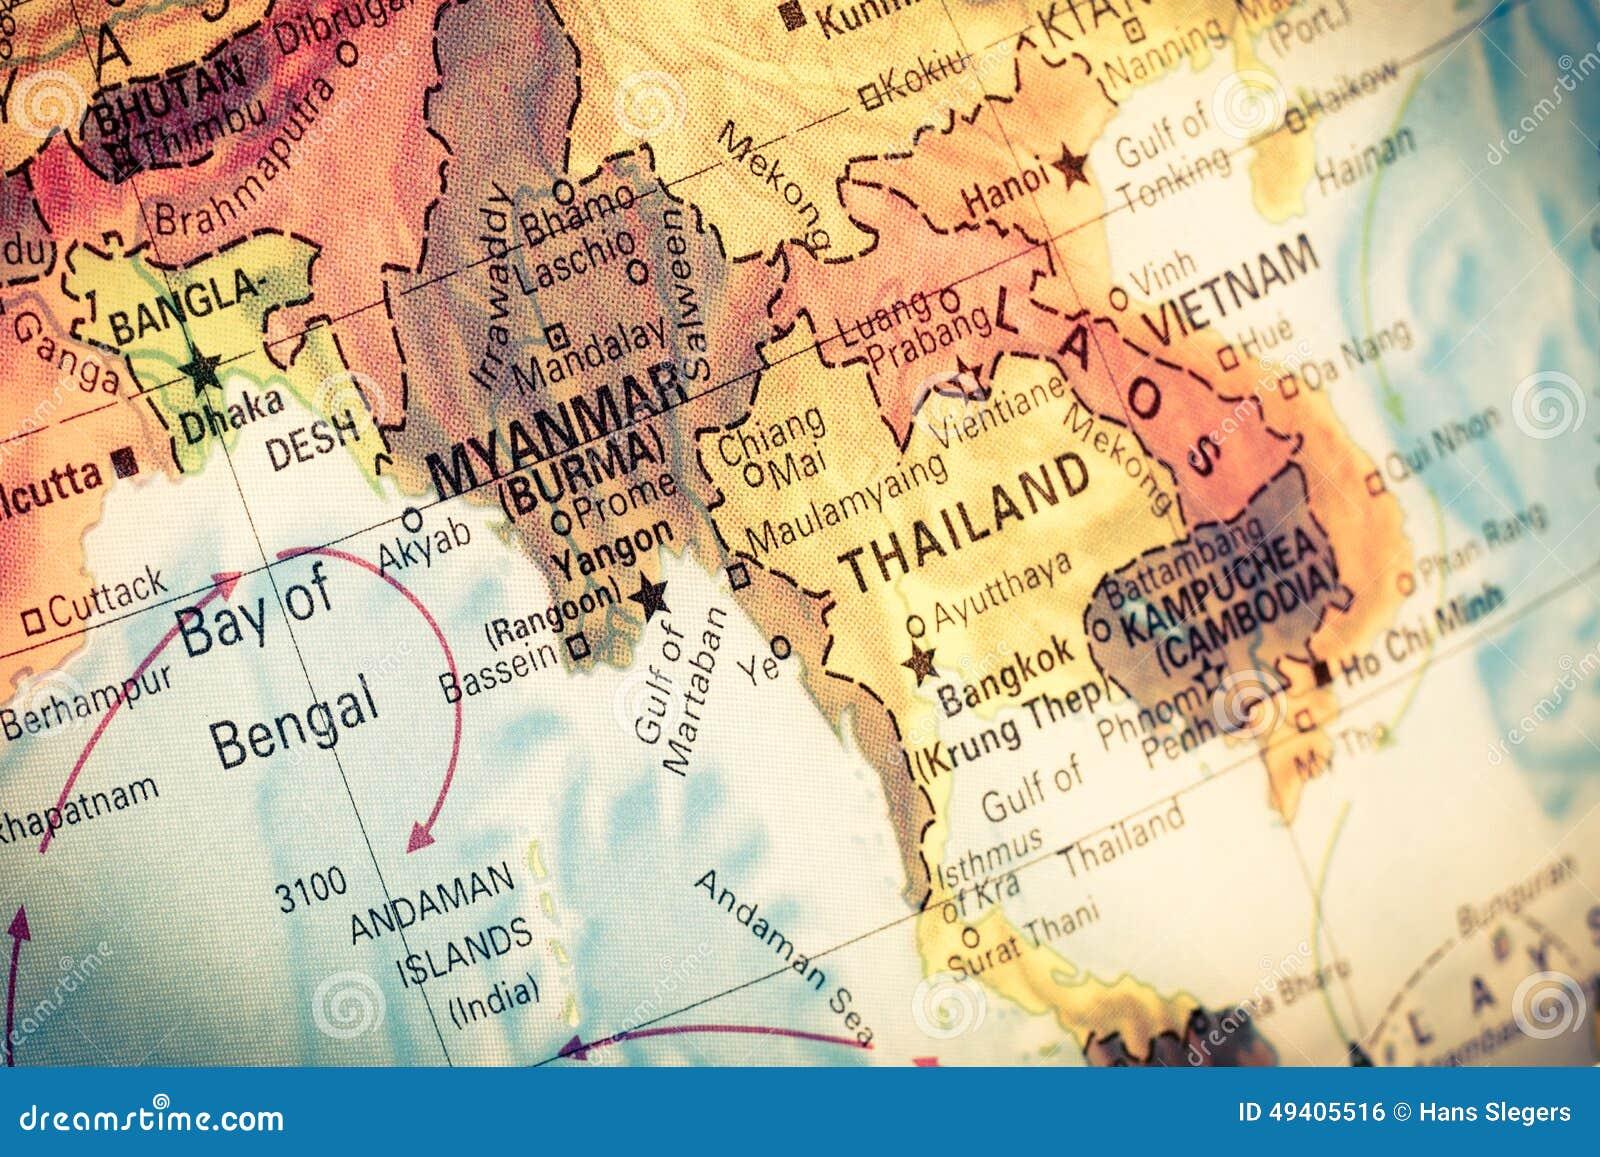 Karte Myanmar.Karte Myanmar Und Birma Stockfoto Bild Von Foto Laos 49405516